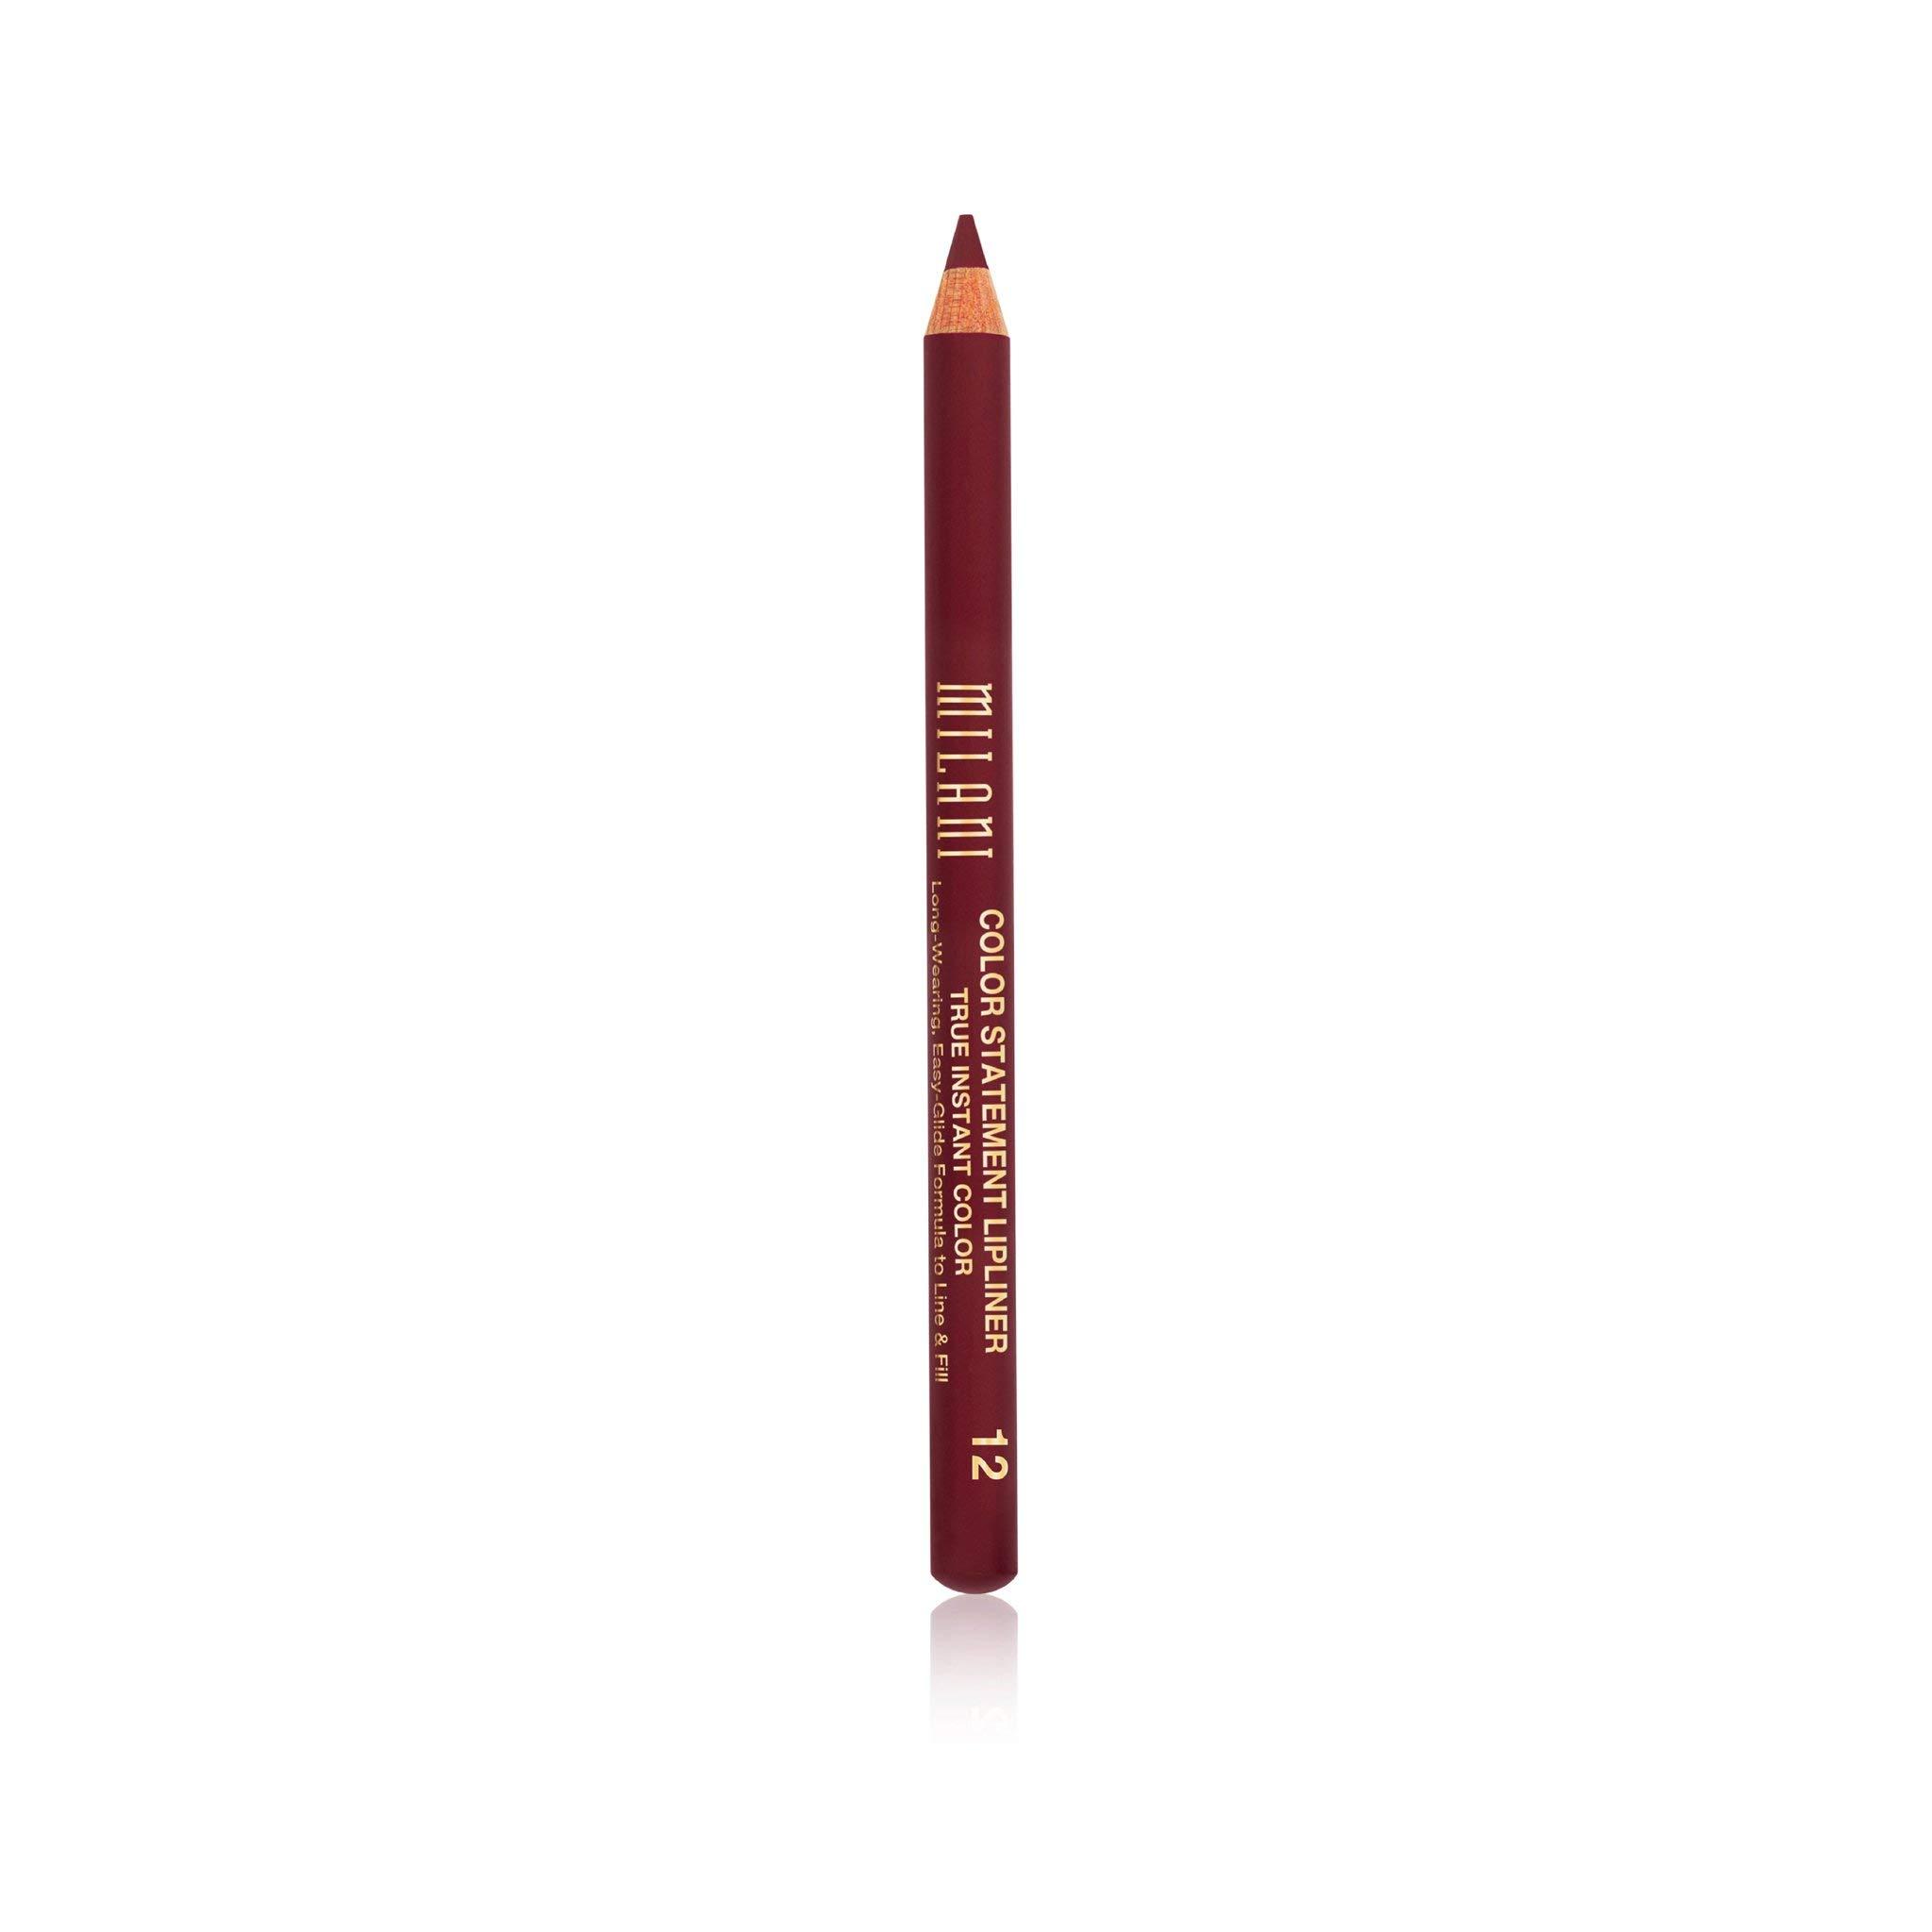 Milani Color Statement Lipliner - Bordeaux (0.04 Ounce) Cruelty-Free Lip Pencil to Define, Shape & Fill Lips